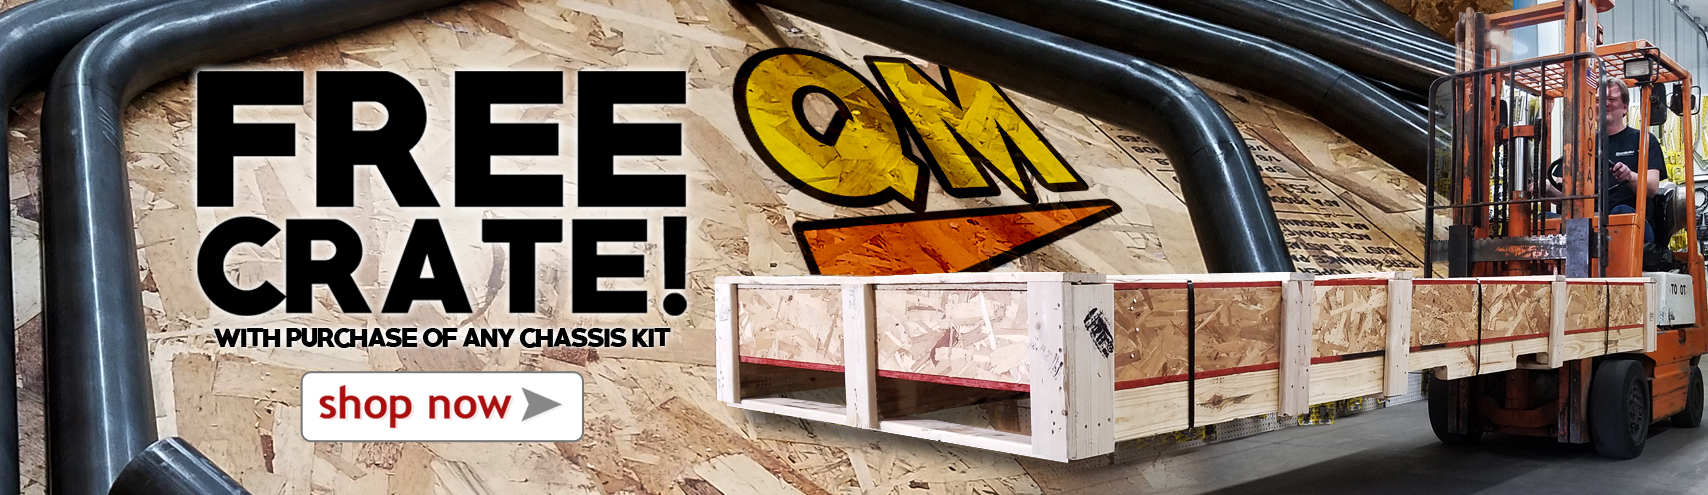 free-crate.jpg